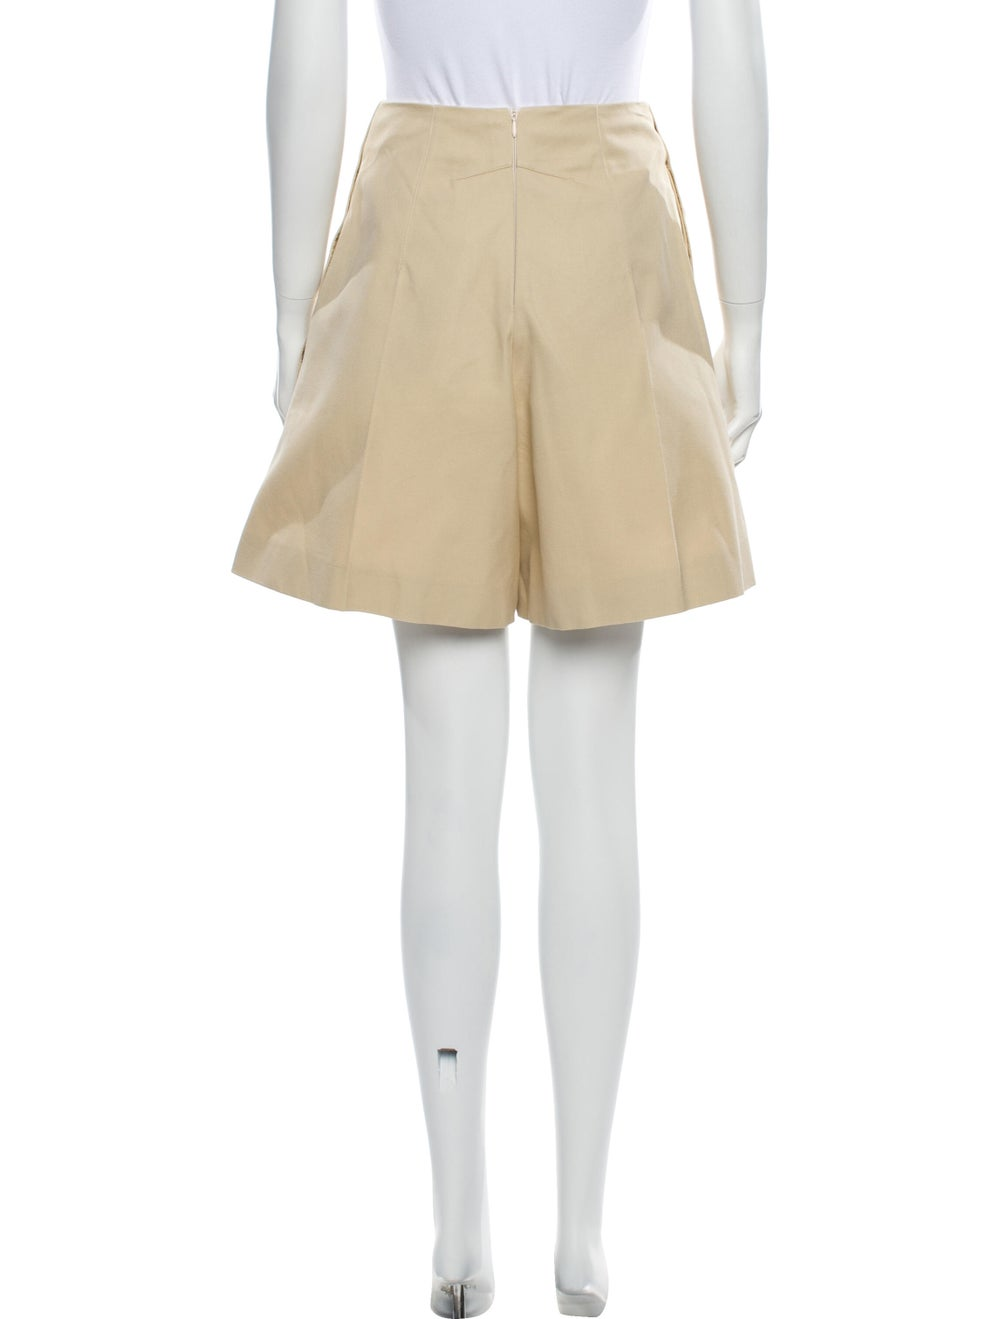 Patou Knee-Length Shorts w/ Tags - image 3